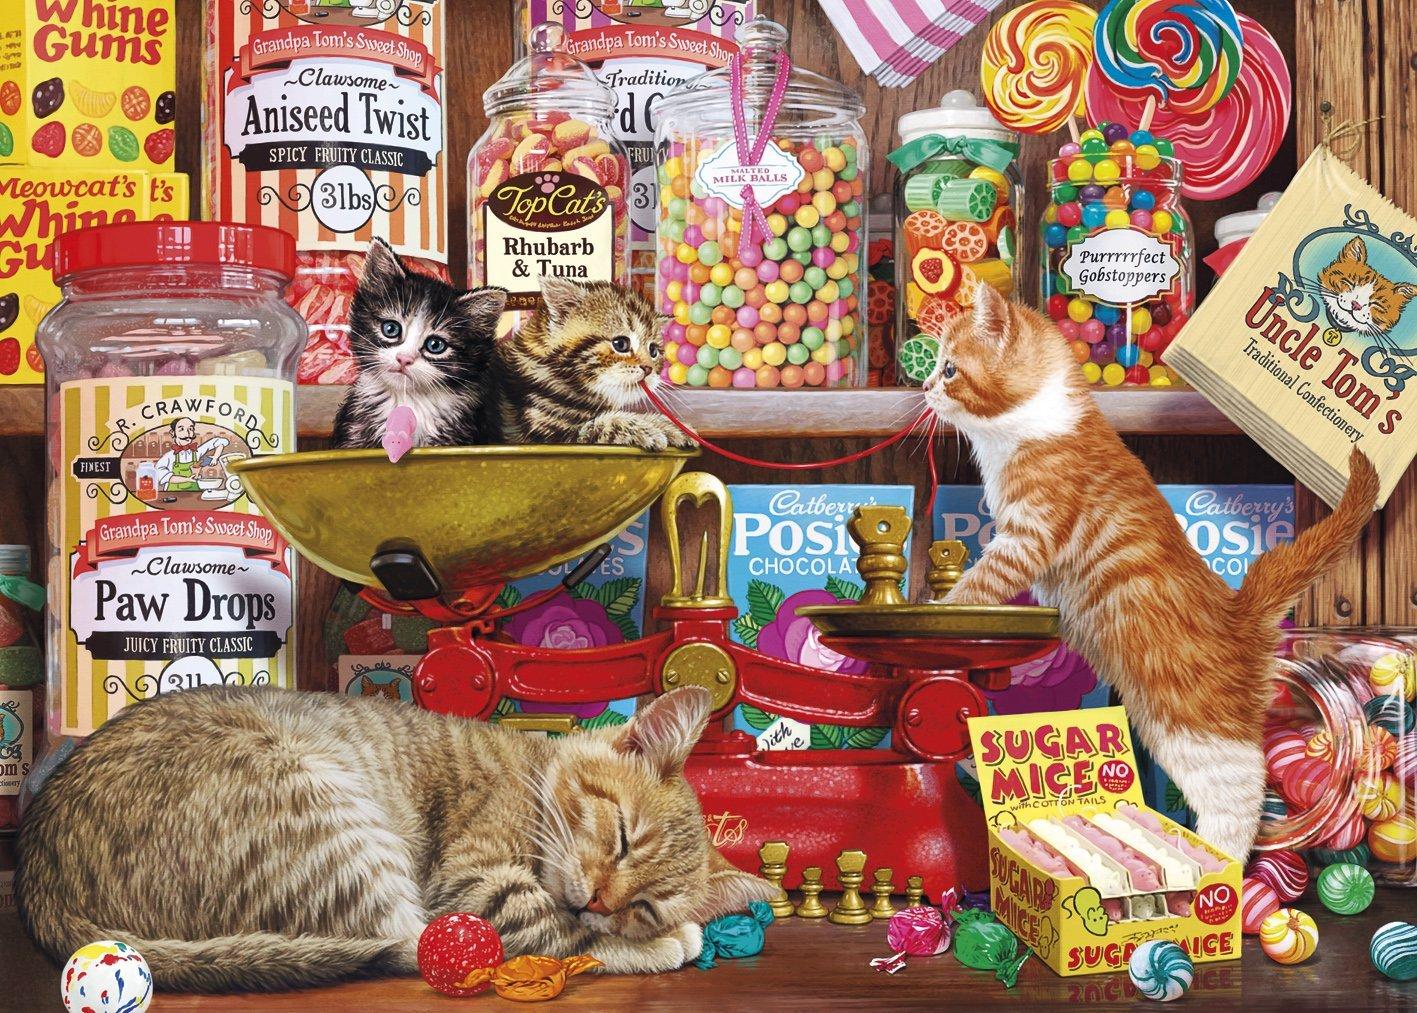 paw-drops-sugar-mice